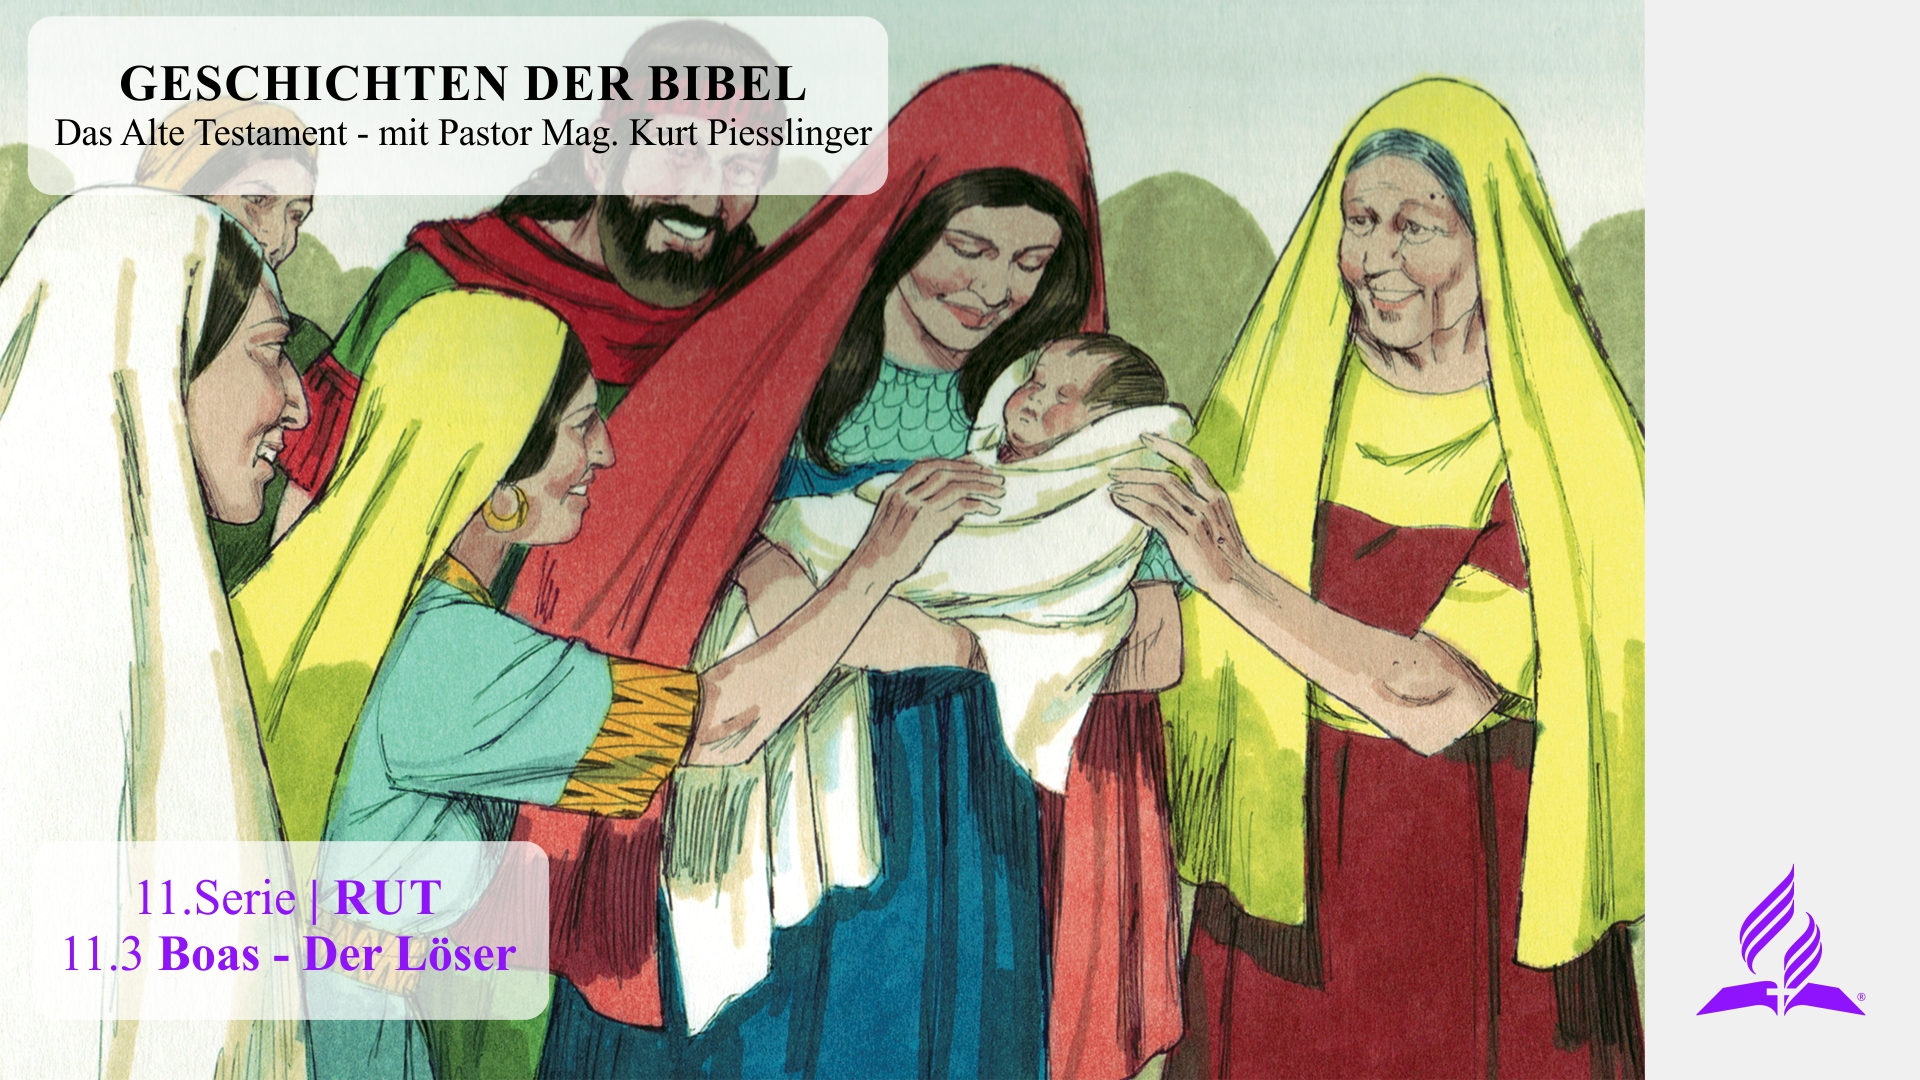 GESCHICHTEN DER BIBEL: 11.3 Boas – Der Löser – 11.RUT | Pastor Mag. Kurt Piesslinger